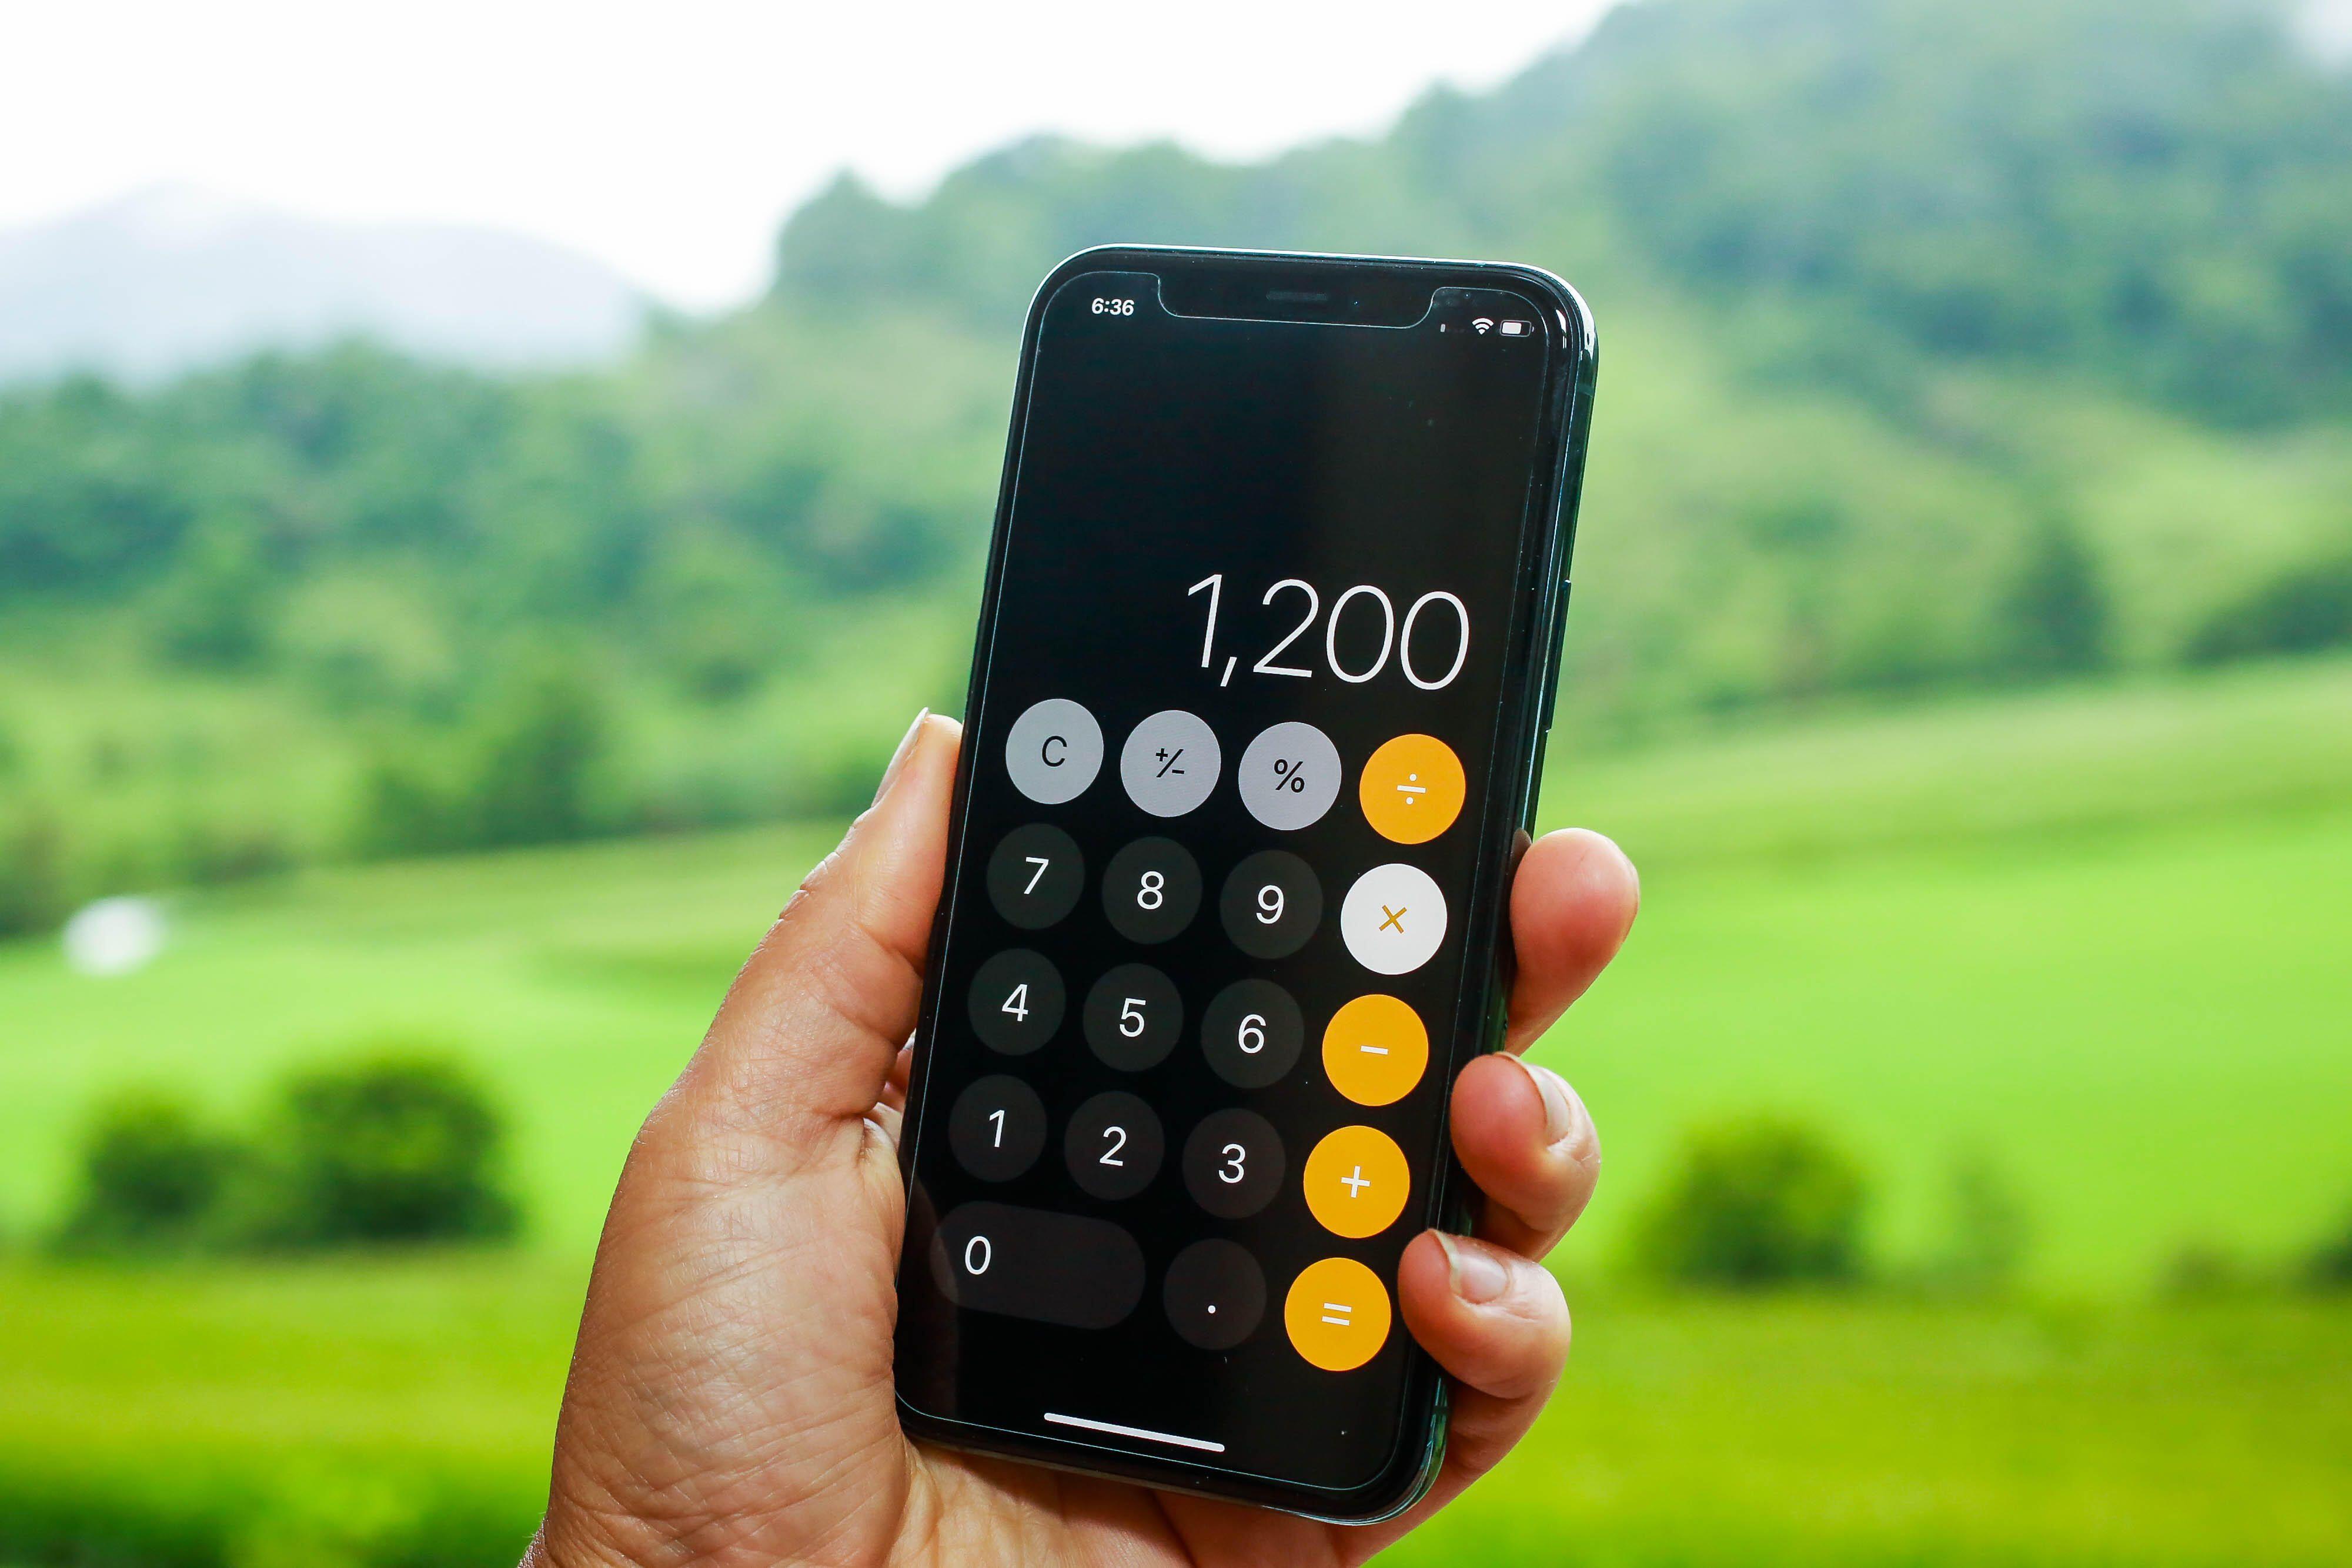 calculate-calculator-amount-of-stimulus-check-2020-cash-money-phone-002